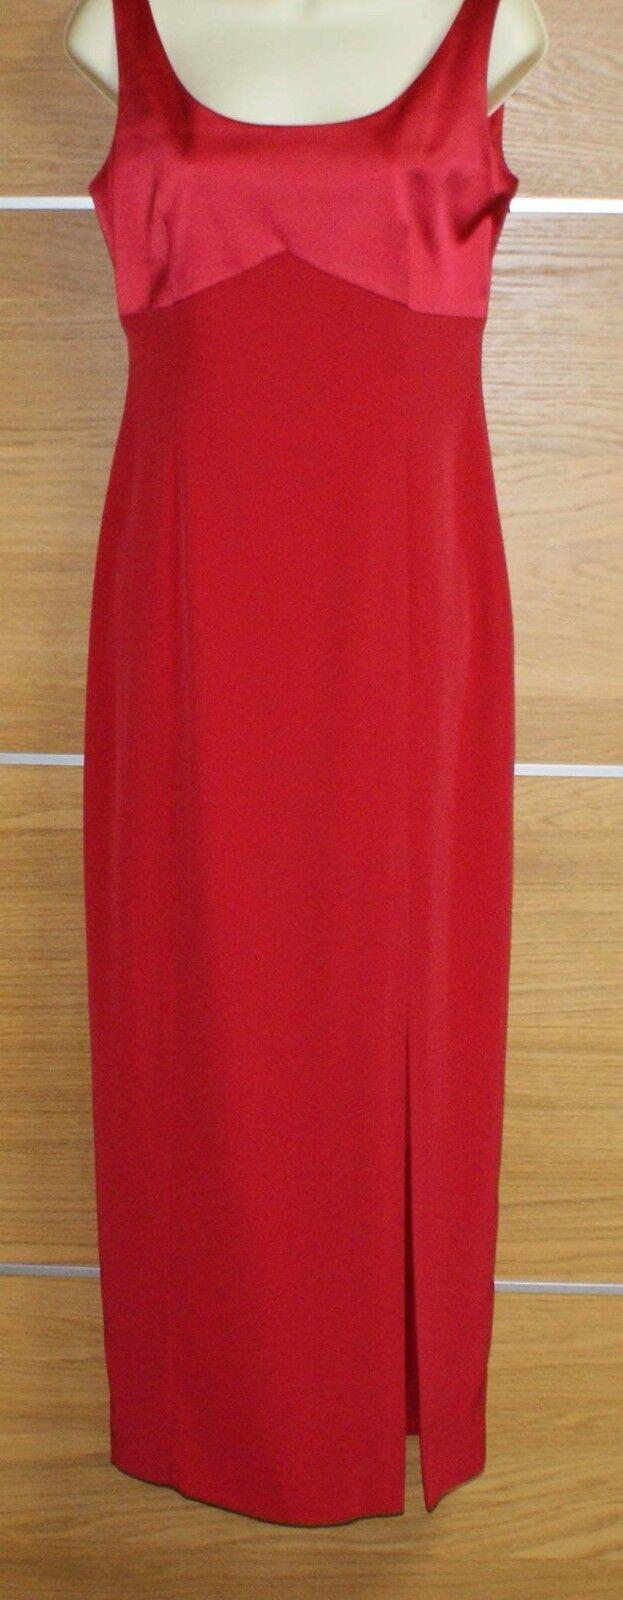 Vestido De ELLIS Fiesta SIMON ELLIS De ocasiones Rojo Talla 10 bff788